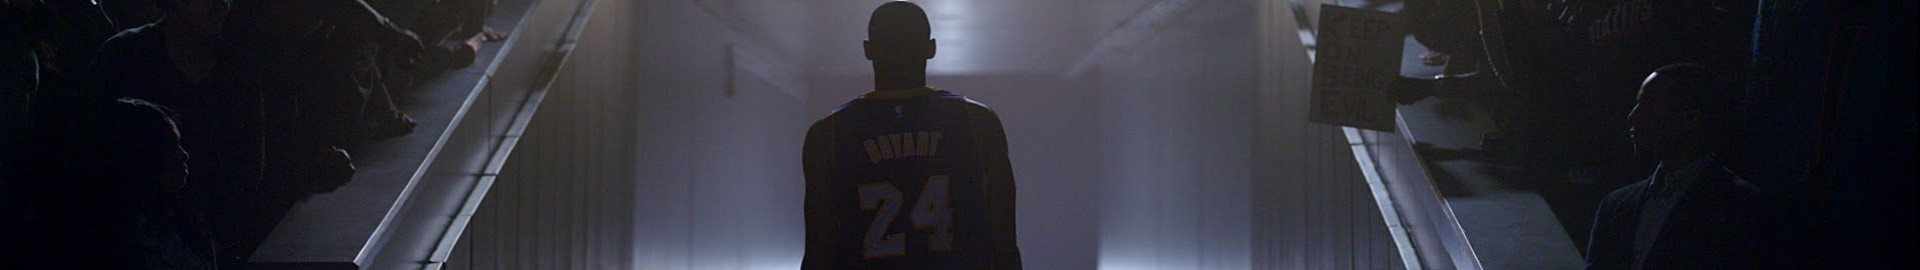 Scarpe Nike da Basket Uomo/Donna/Bambino   Basket Zone Siena